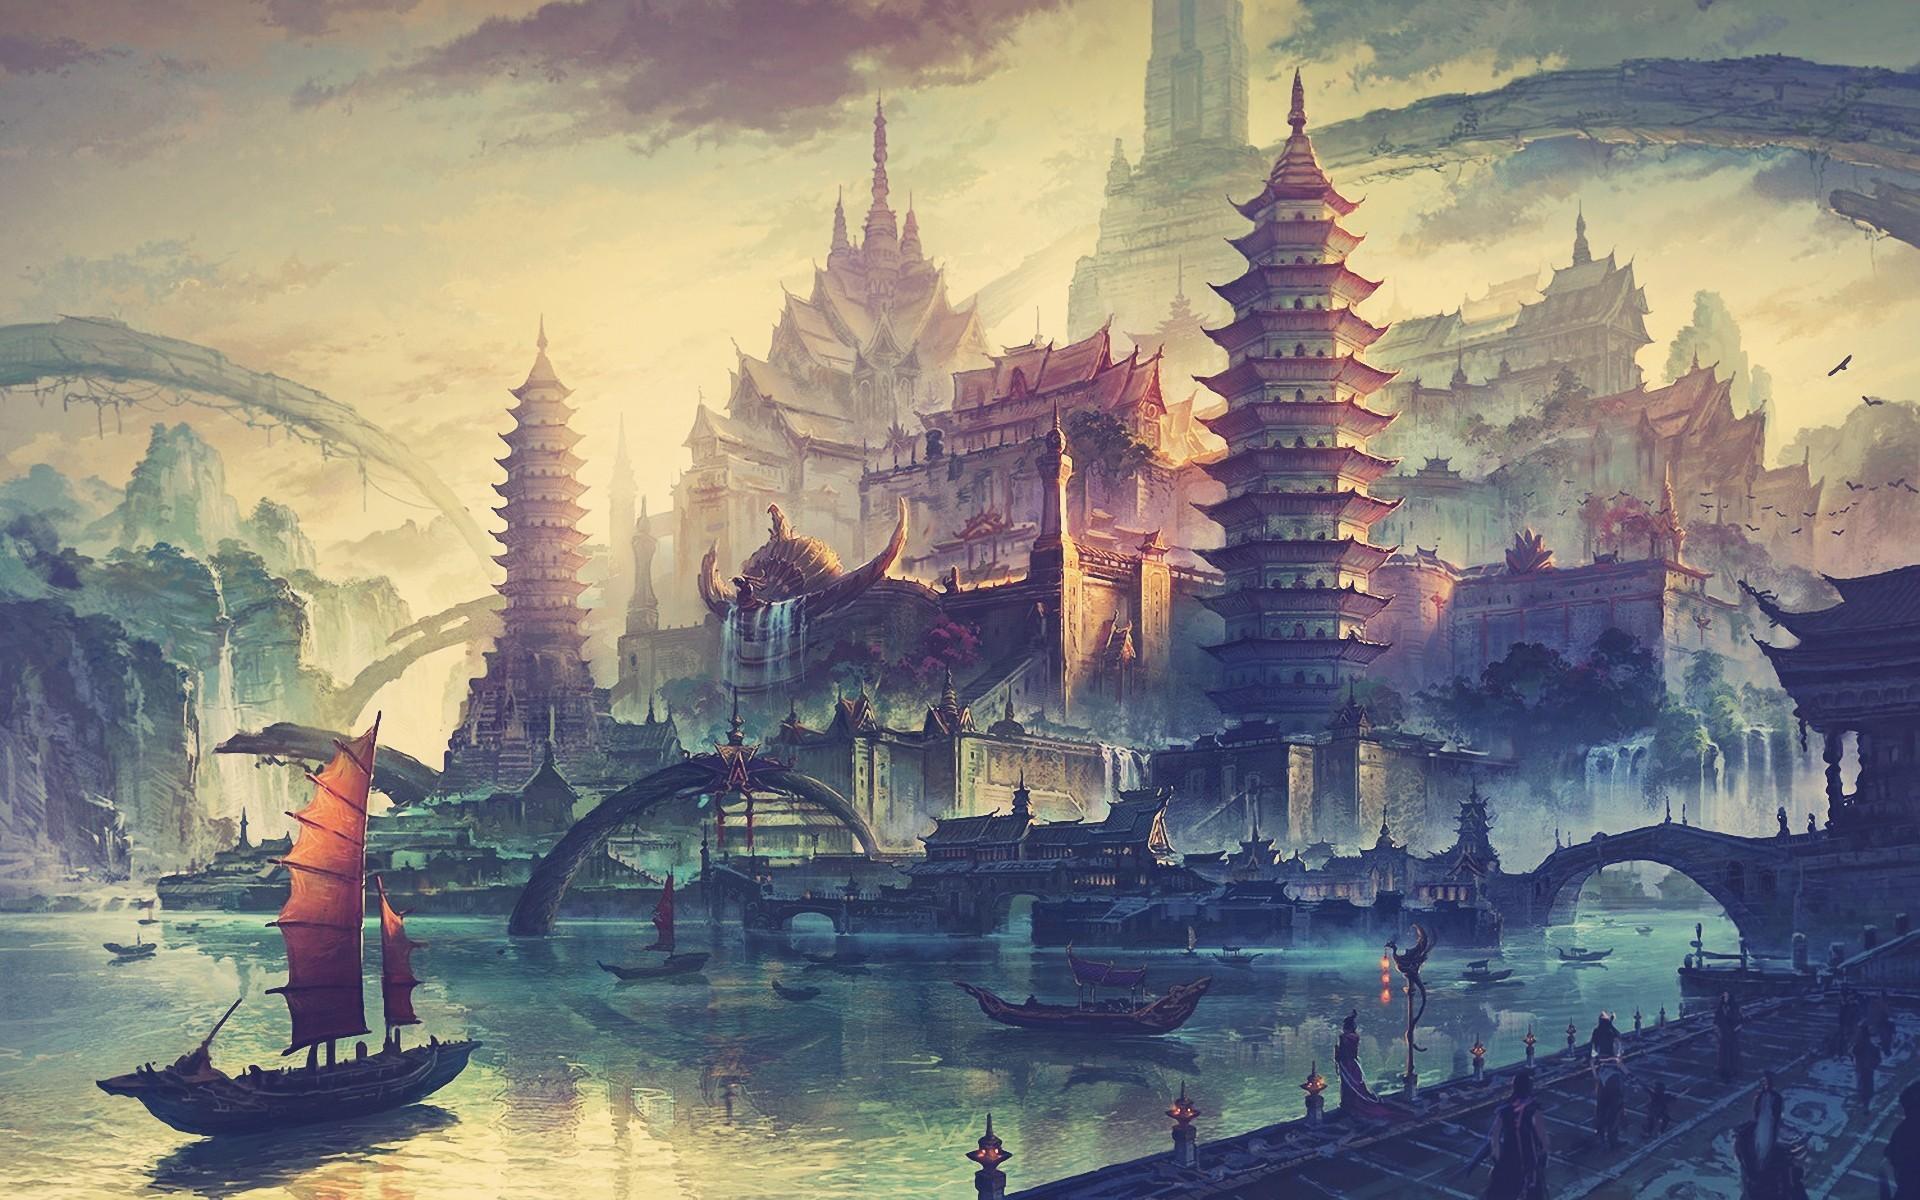 General 1920x1200 artwork boat Asian architecture fantasy art fantasy city China Town drawing ancient